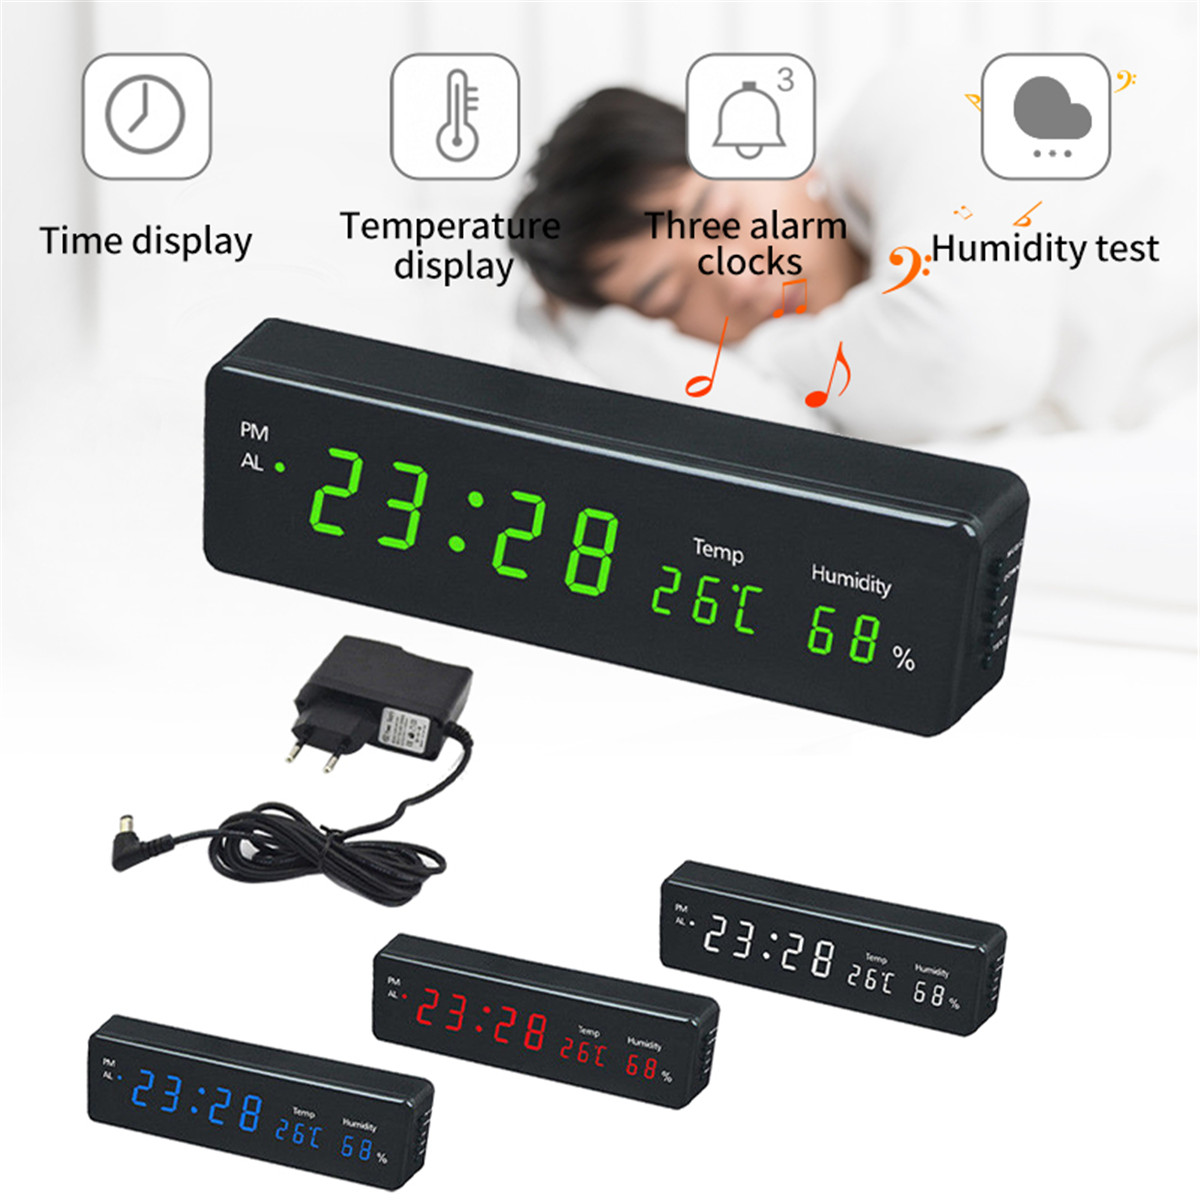 Table Desk Digital Clock LED Temperature Humidity Display Electronic Wall Watch Desktop Digital Table Clocks EU Plug Green Blue